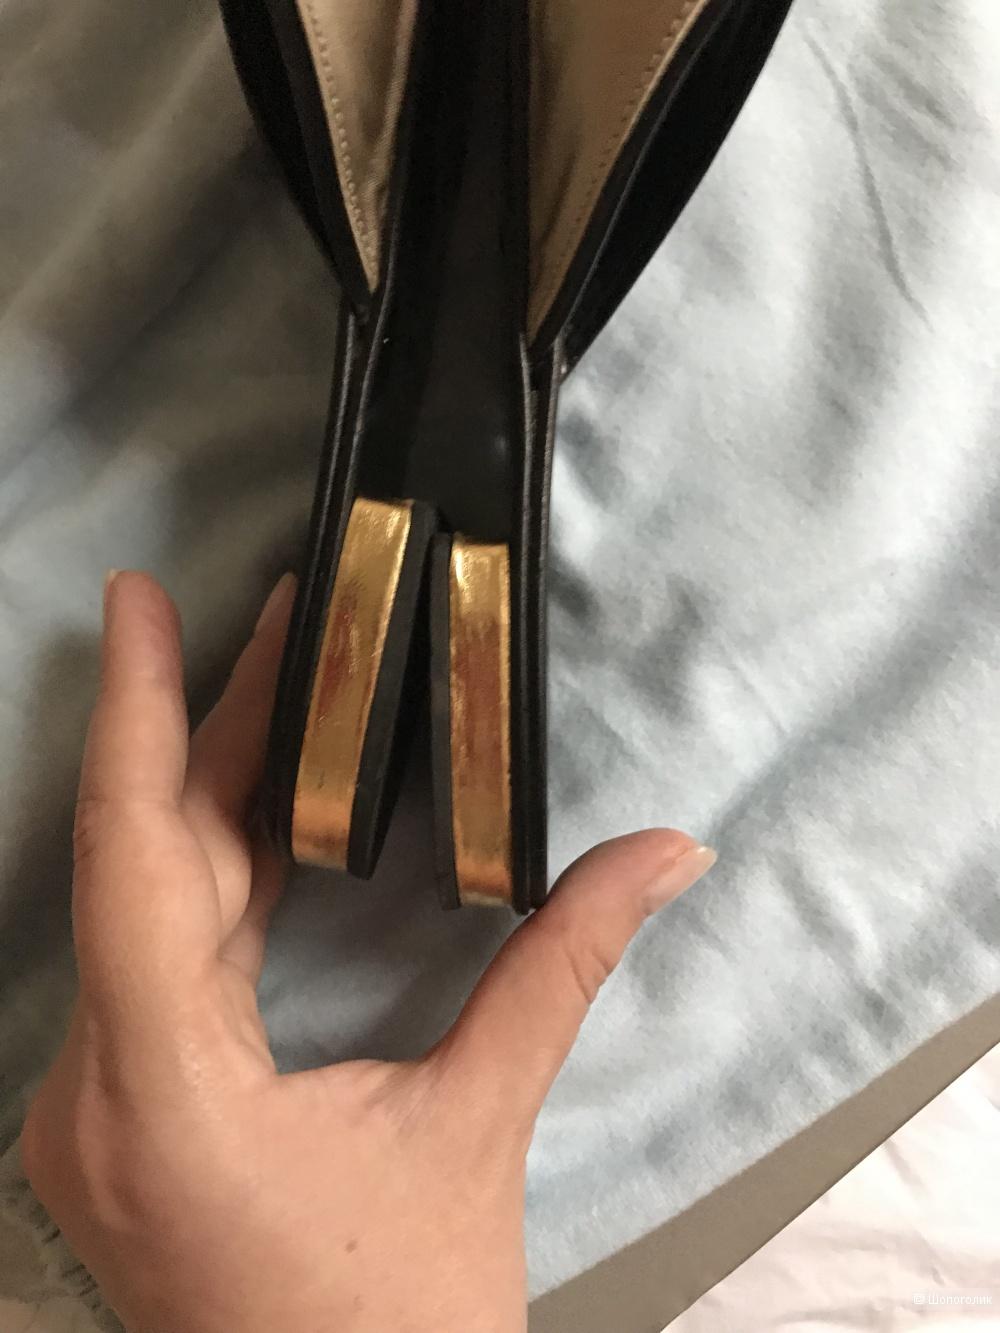 Шлепанцы-сандалии  Roccobarocco,39-40рус